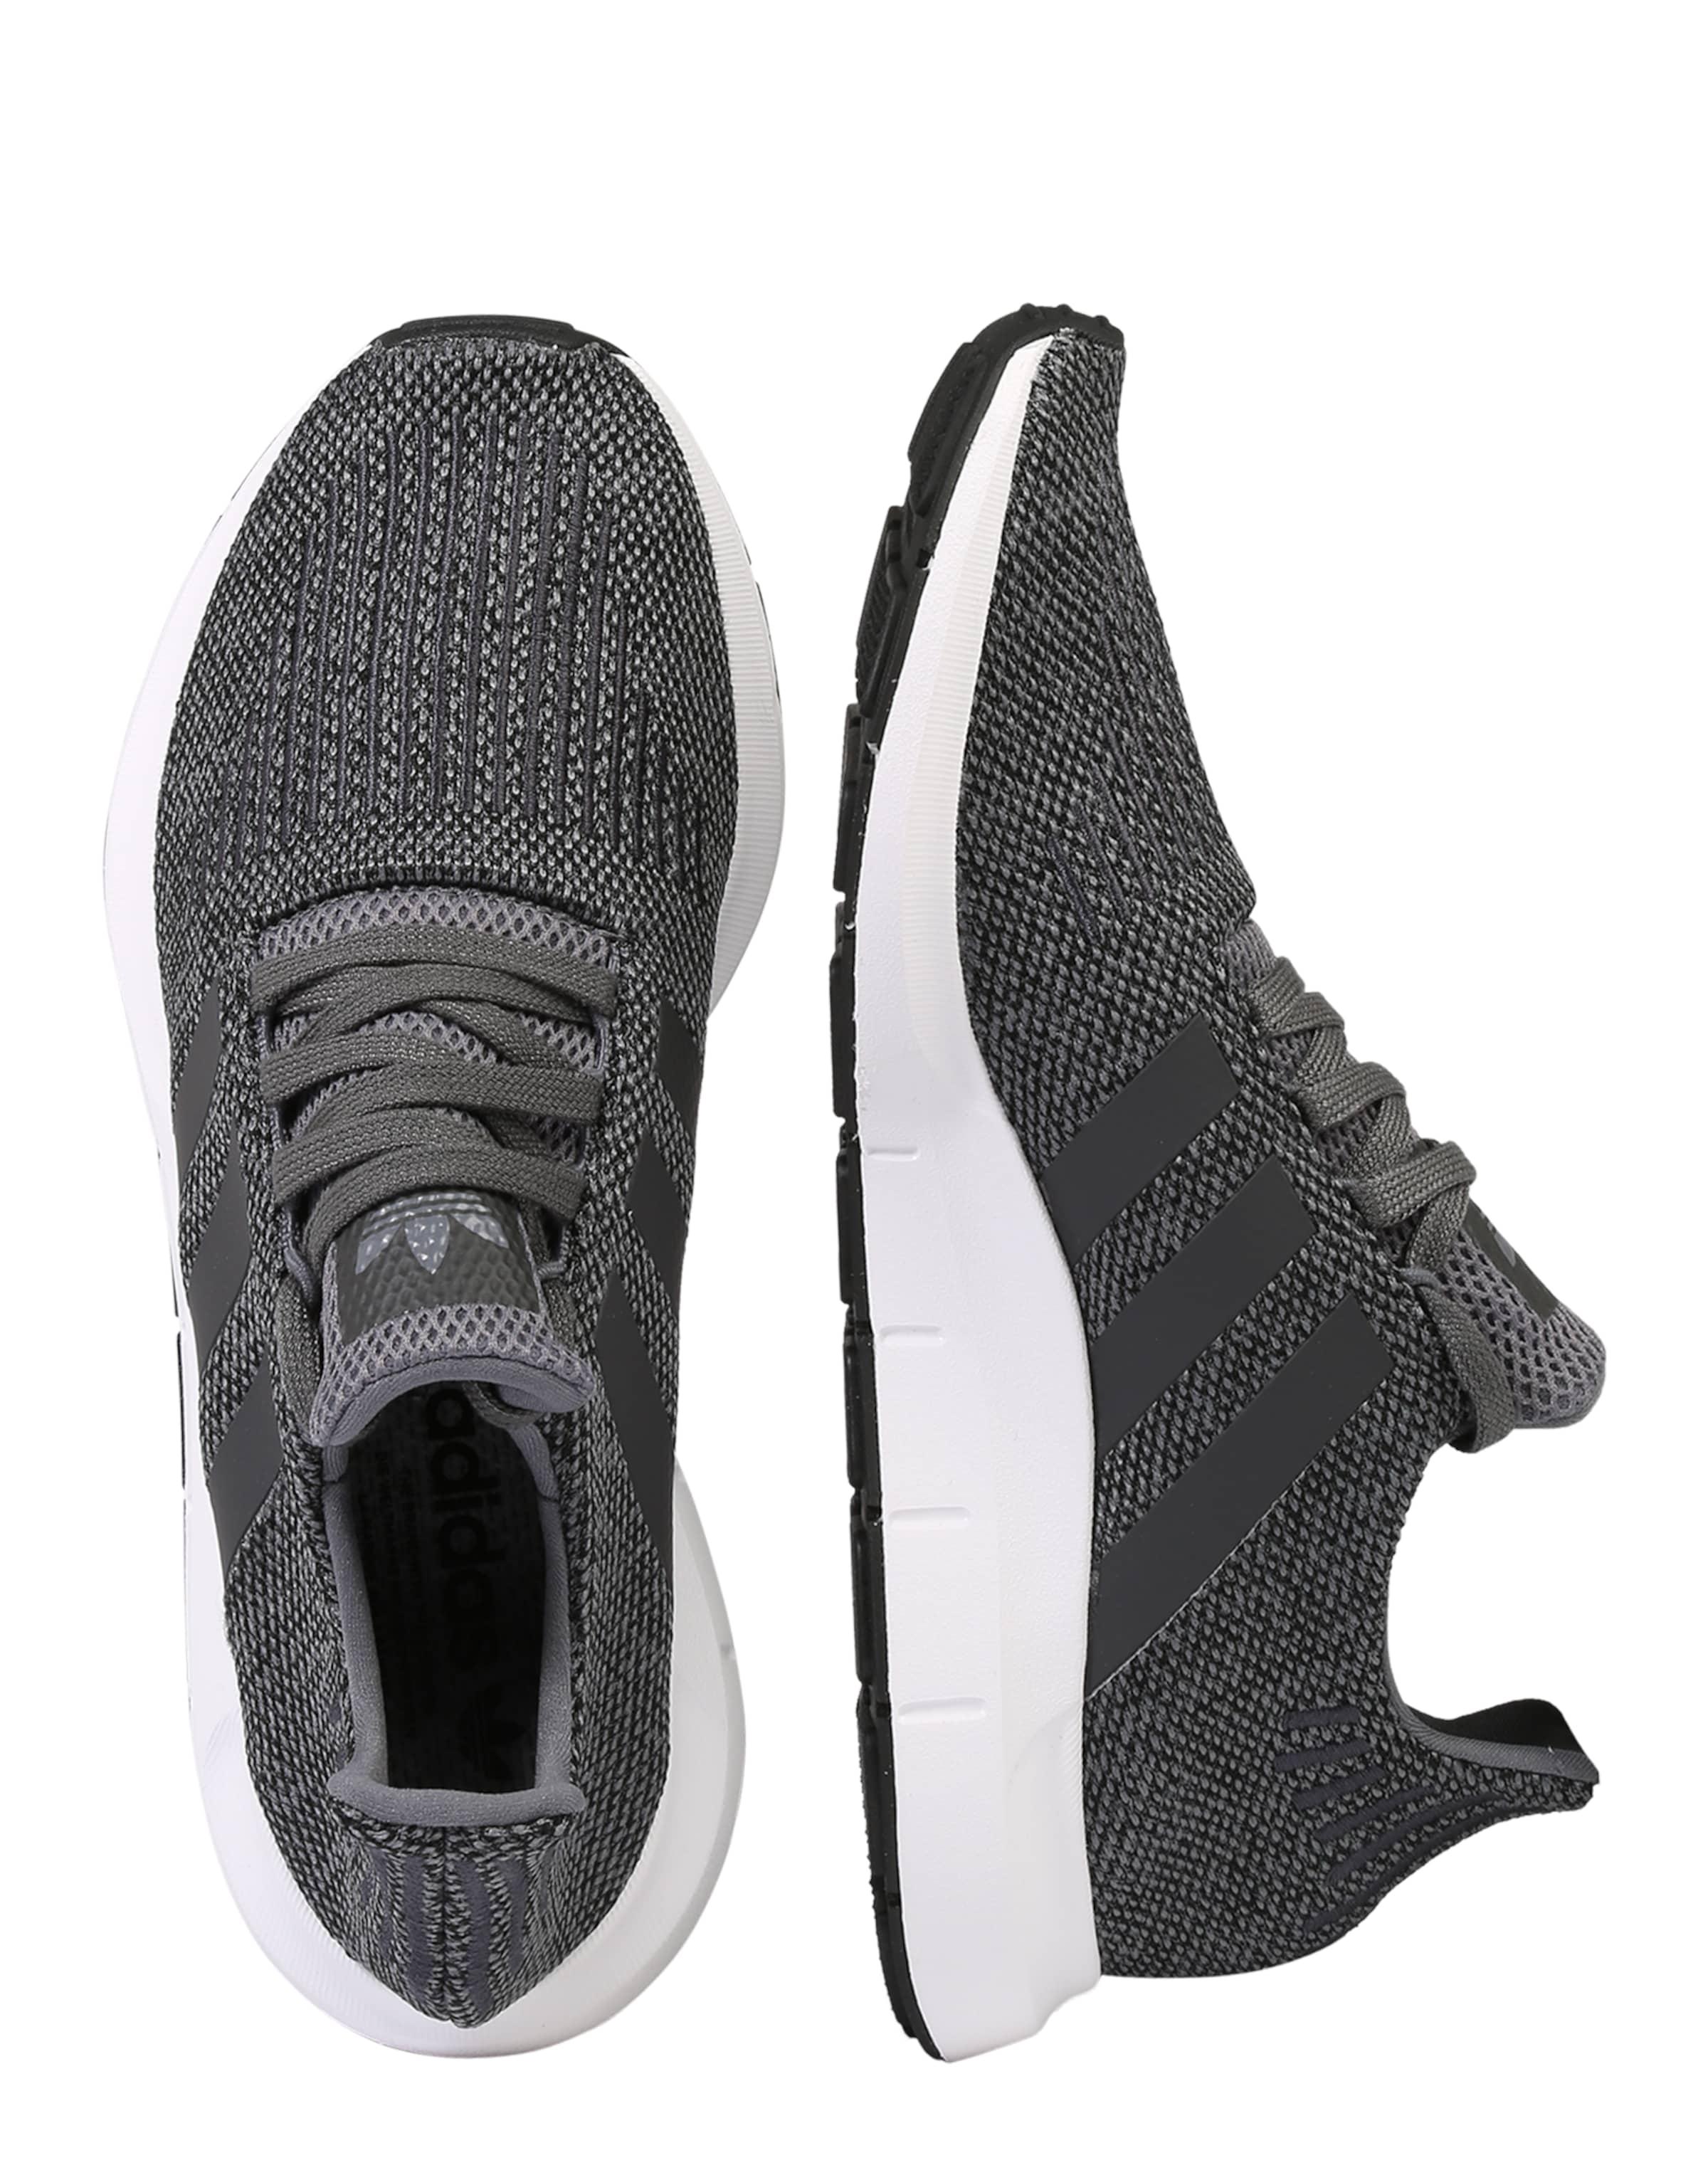 ADIDAS ORIGINALS Sneakers 'Swift Run' Komfortable Online-Verkauf 8PXvSDwjZ